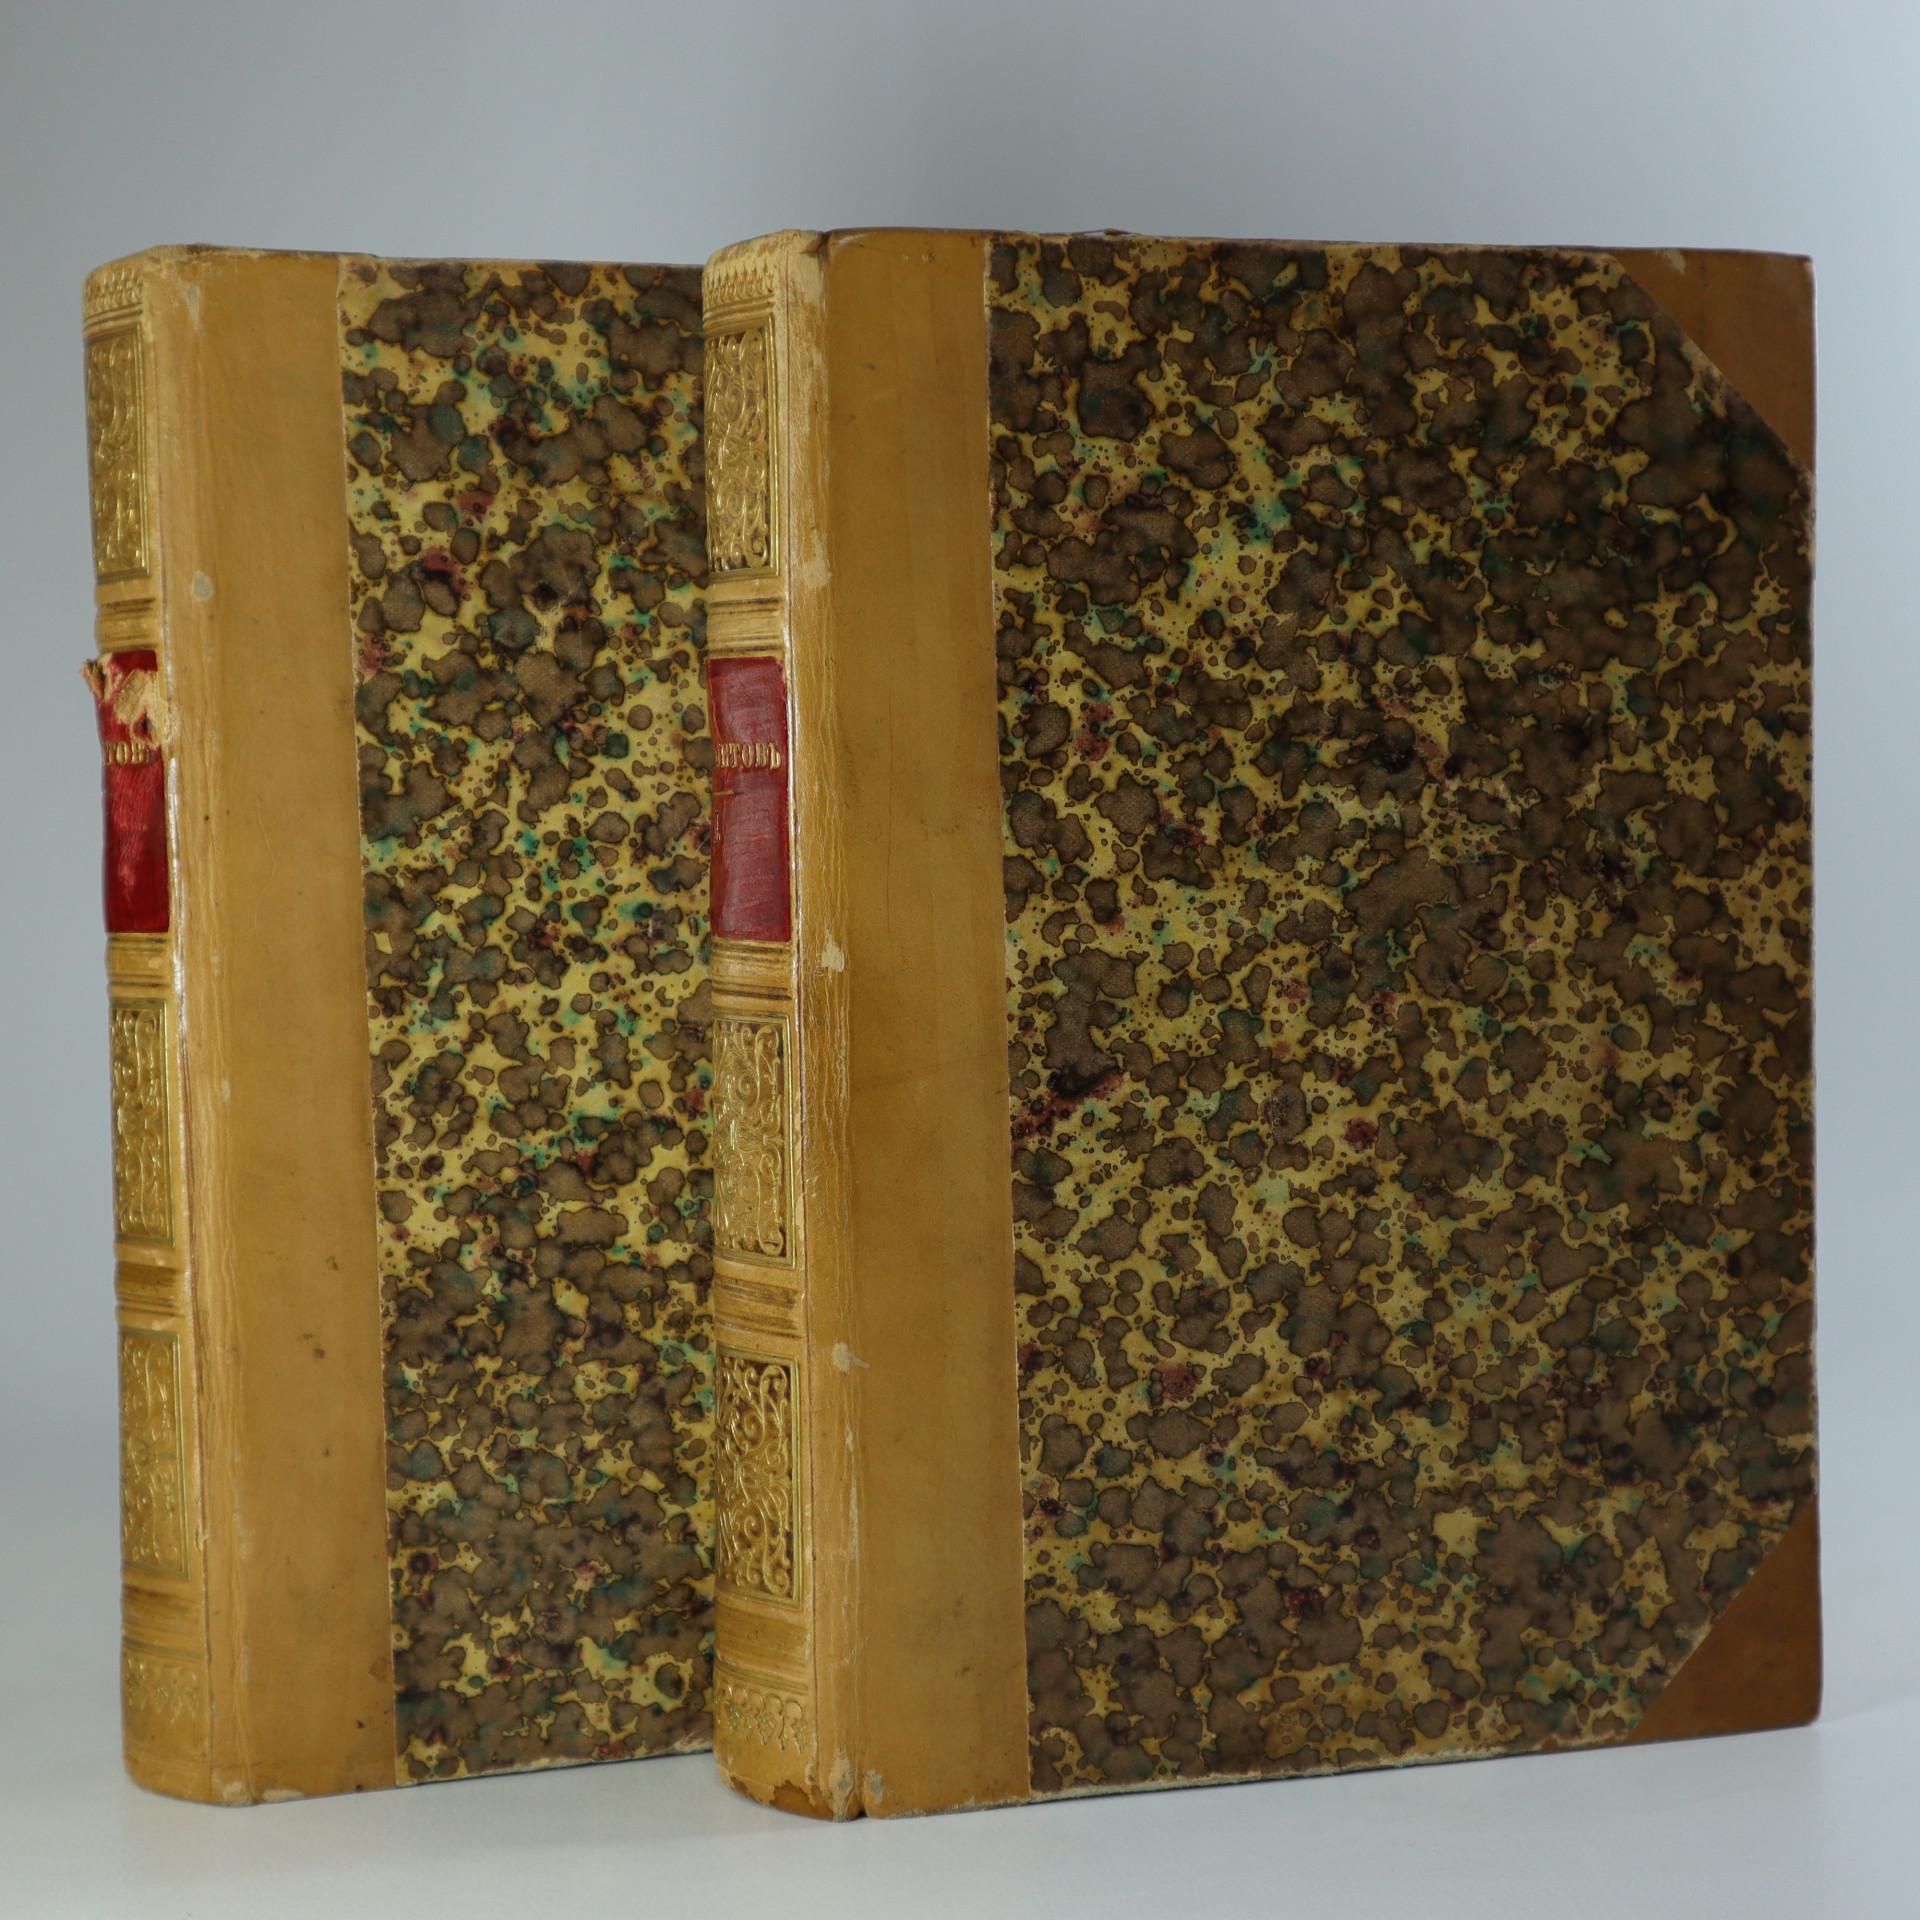 antikvární kniha Сочинения Лермонтова том 1-2 (Spisy Lermontova 2 svazky), 1882, 1887